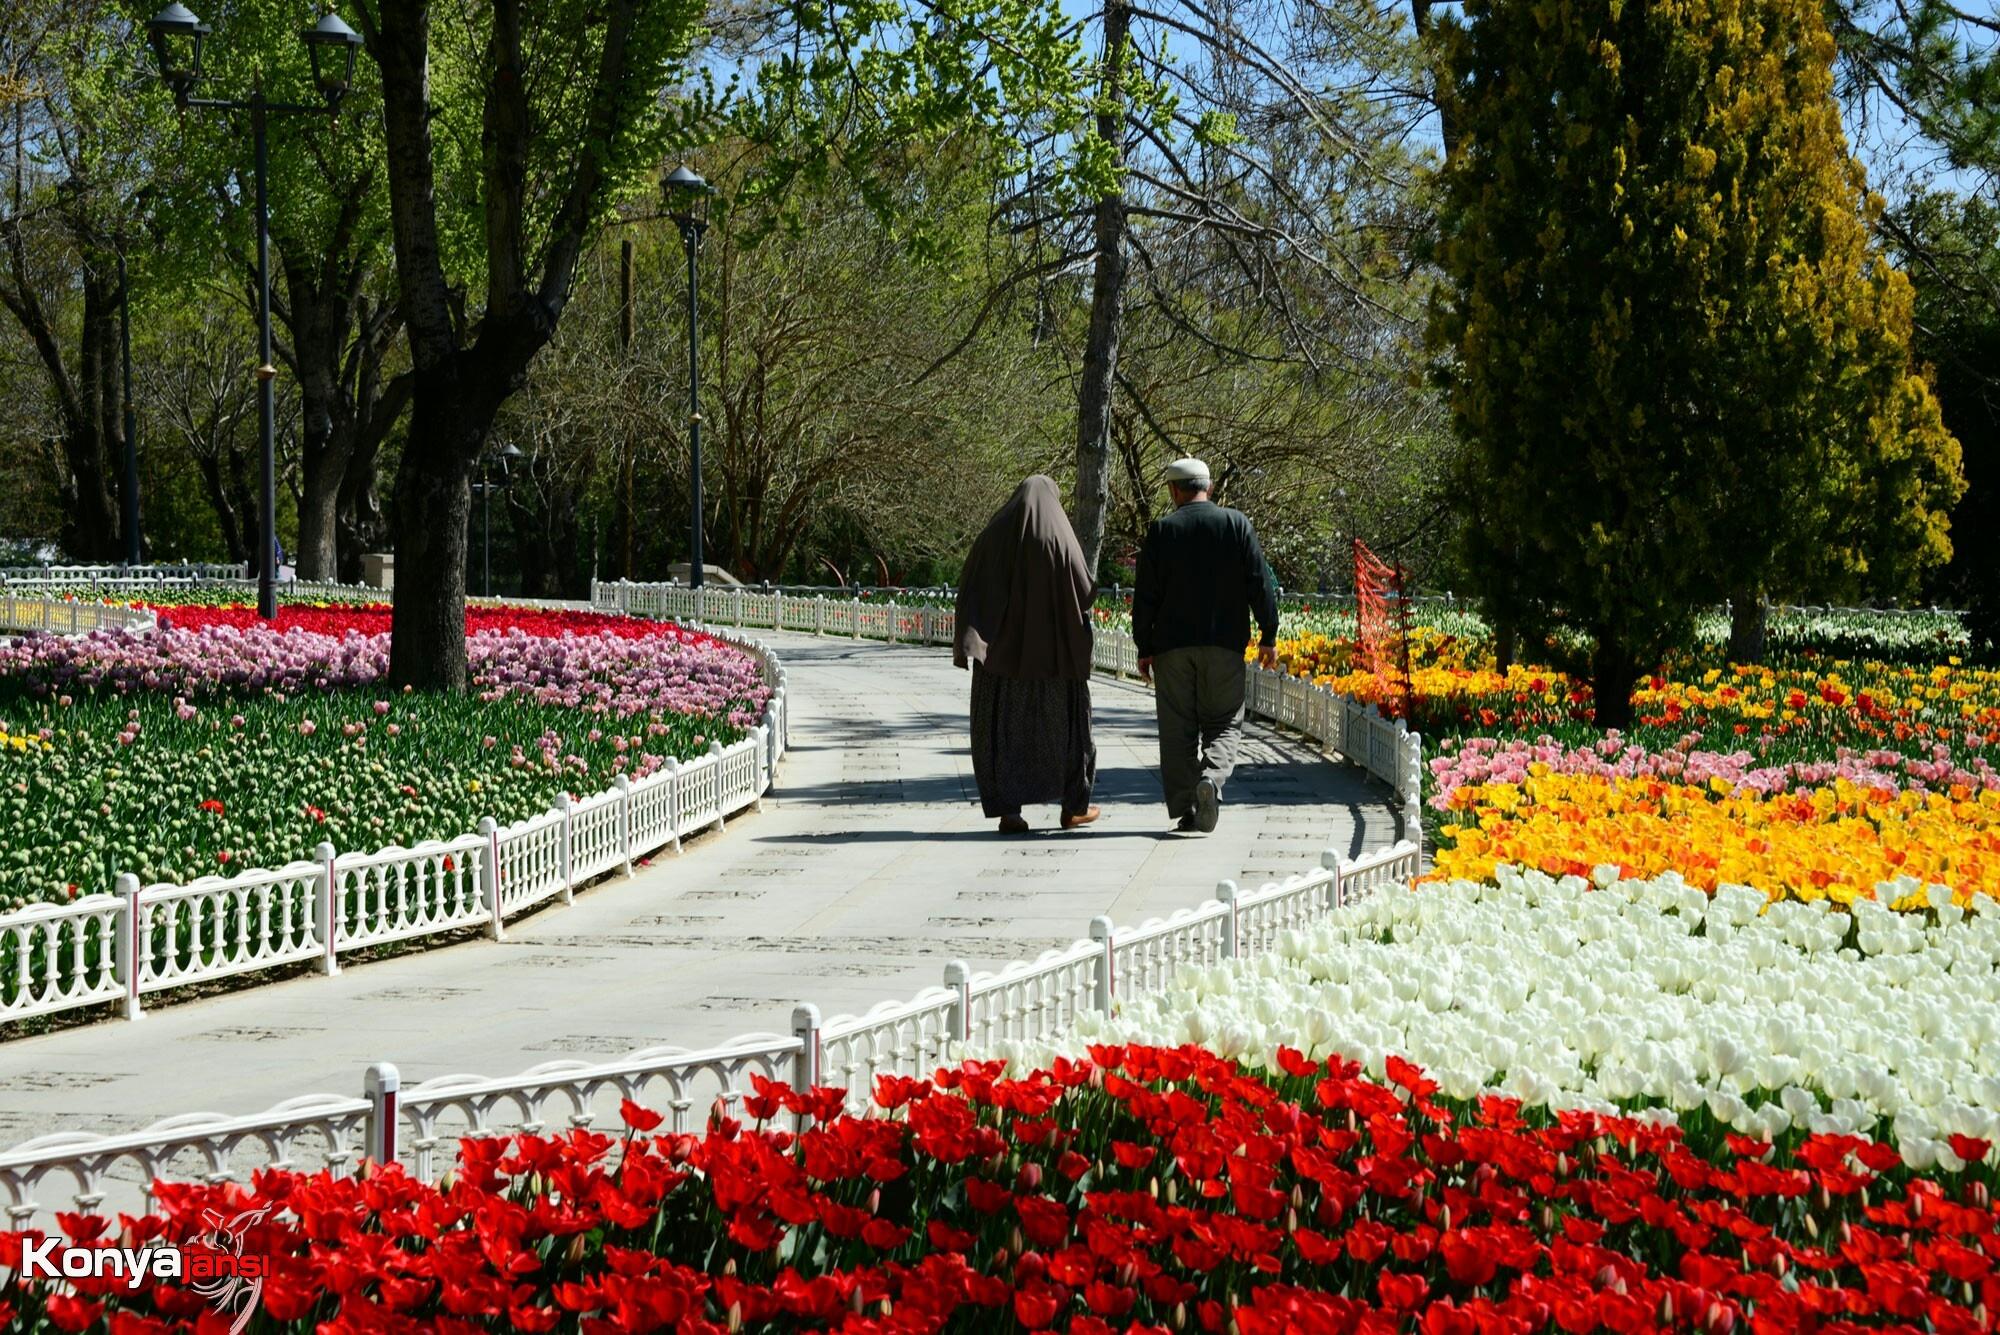 Konya Alâaddin tepesinde Lalezar  by konyaajansi